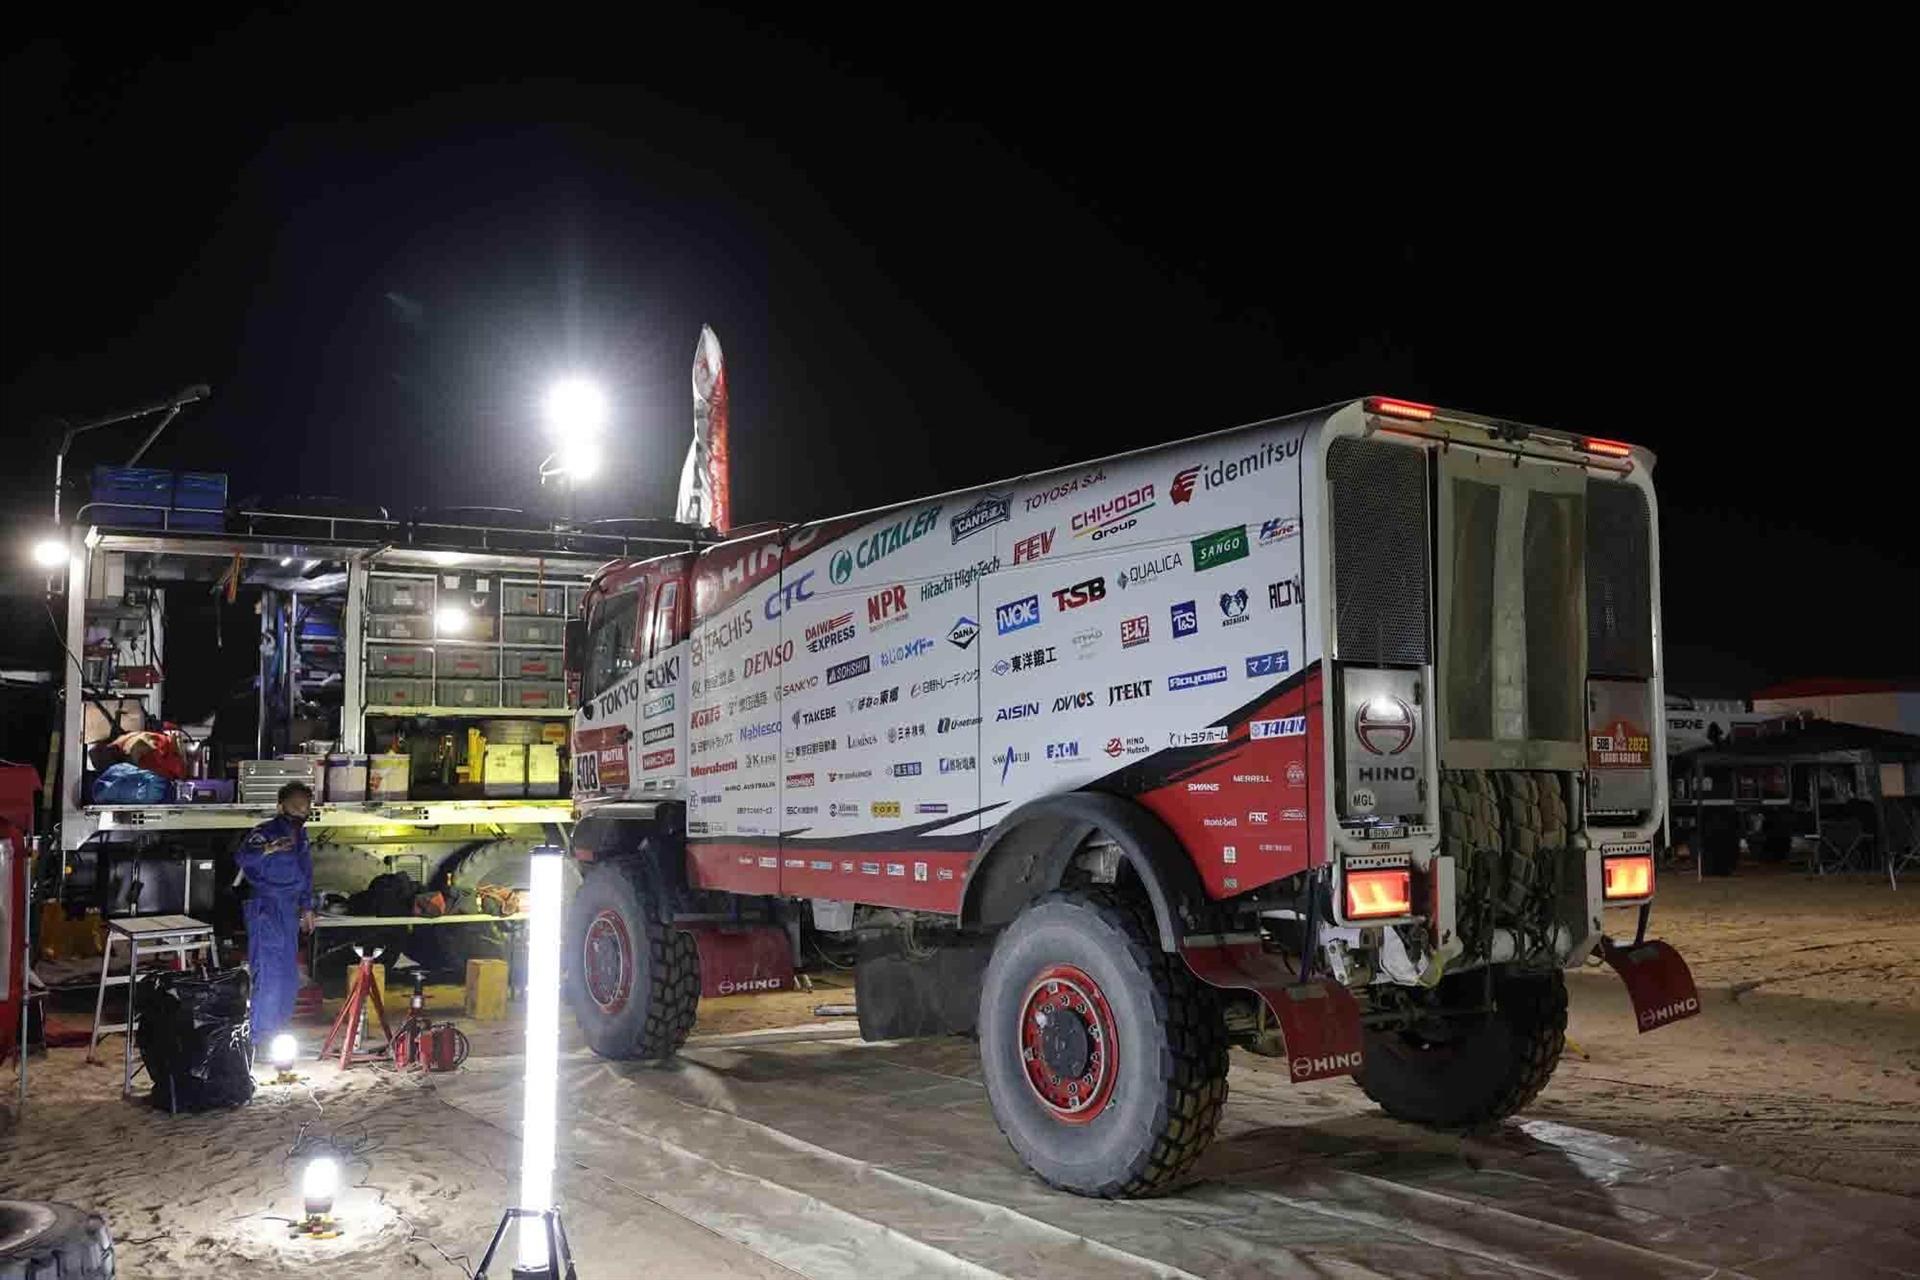 Dakar Rally Truck